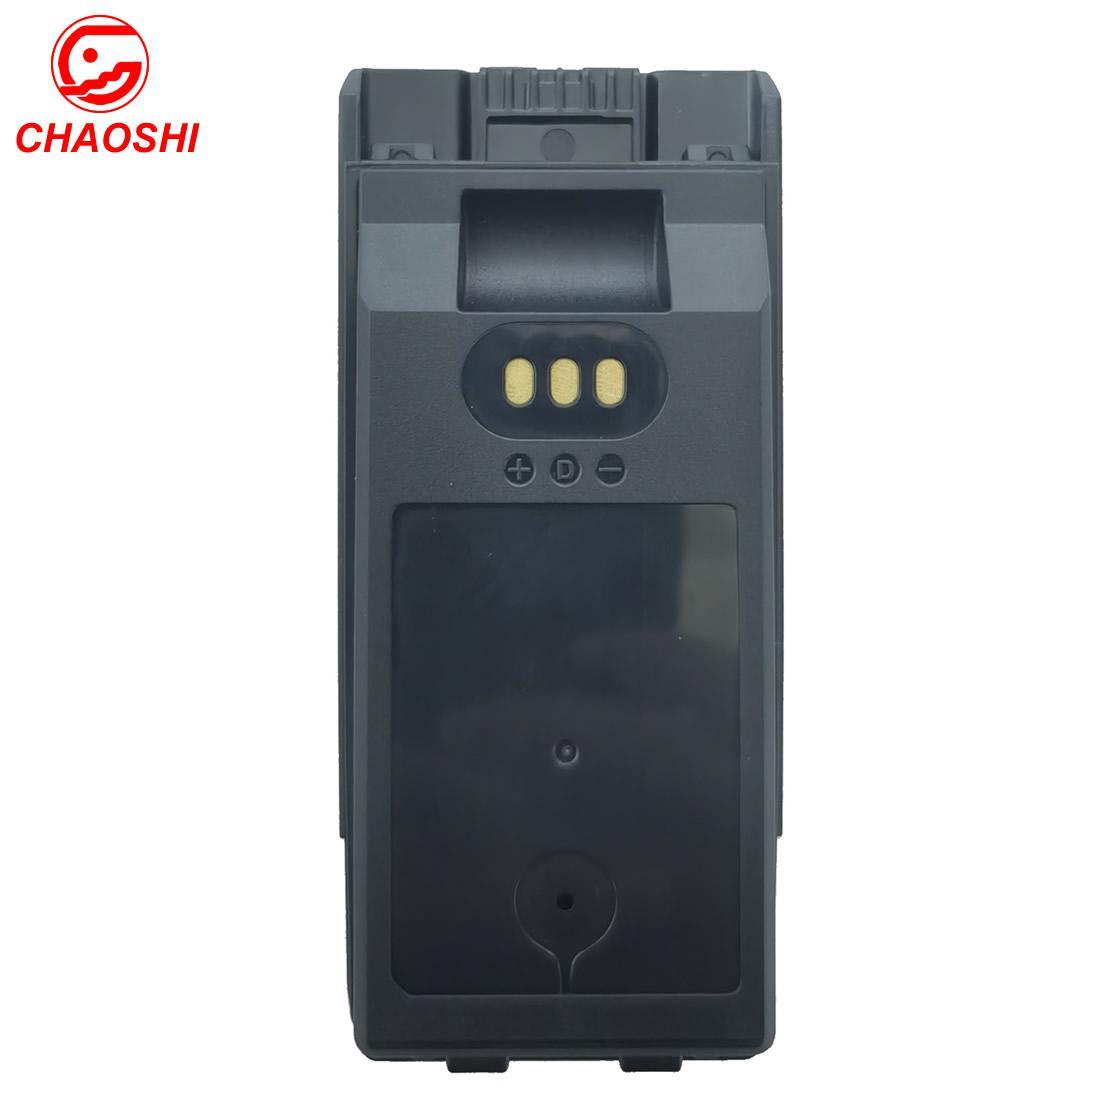 BP284對講機電池 IC-F3400D, IC-F4400D, IC-F70 2